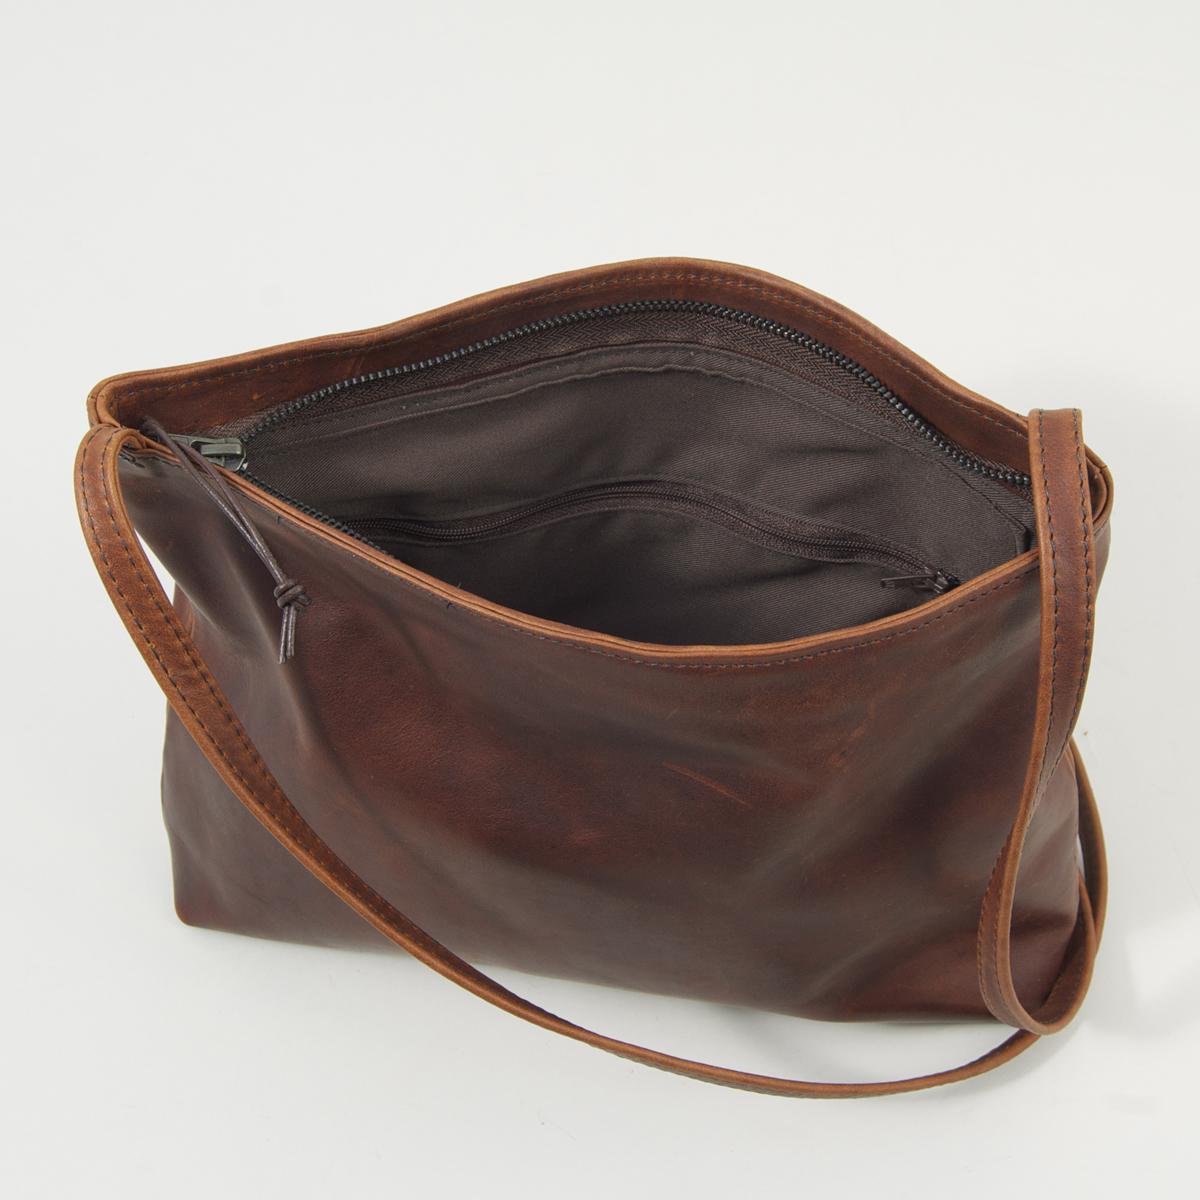 The Softy Bag